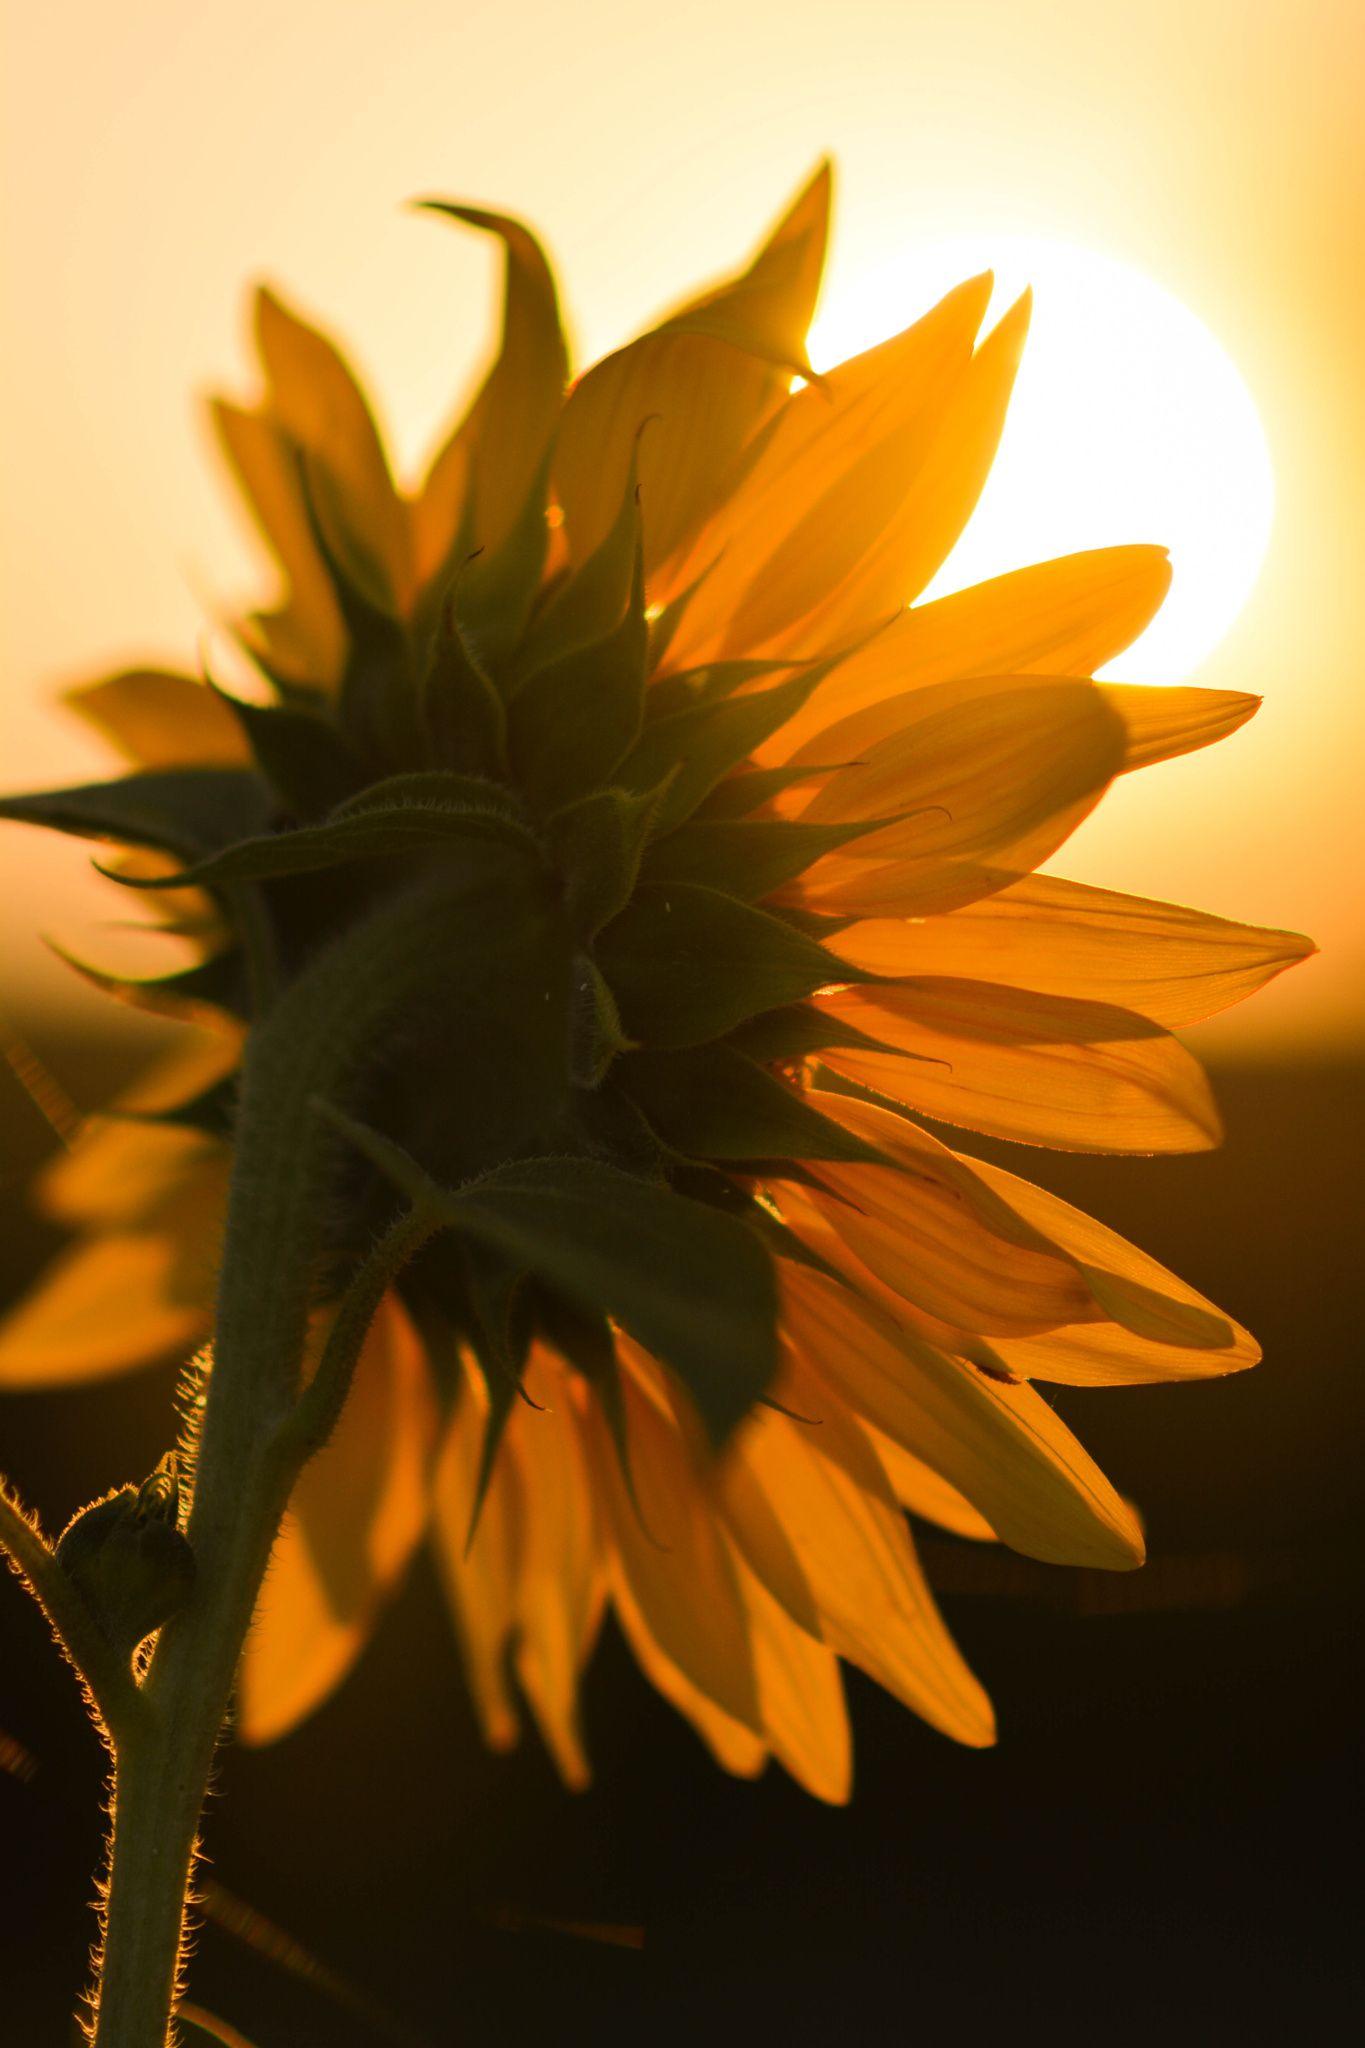 Sunflower Sunflowers Moonflowers Sunflower Photography Sunflower Pictures Sunflower Wallpaper